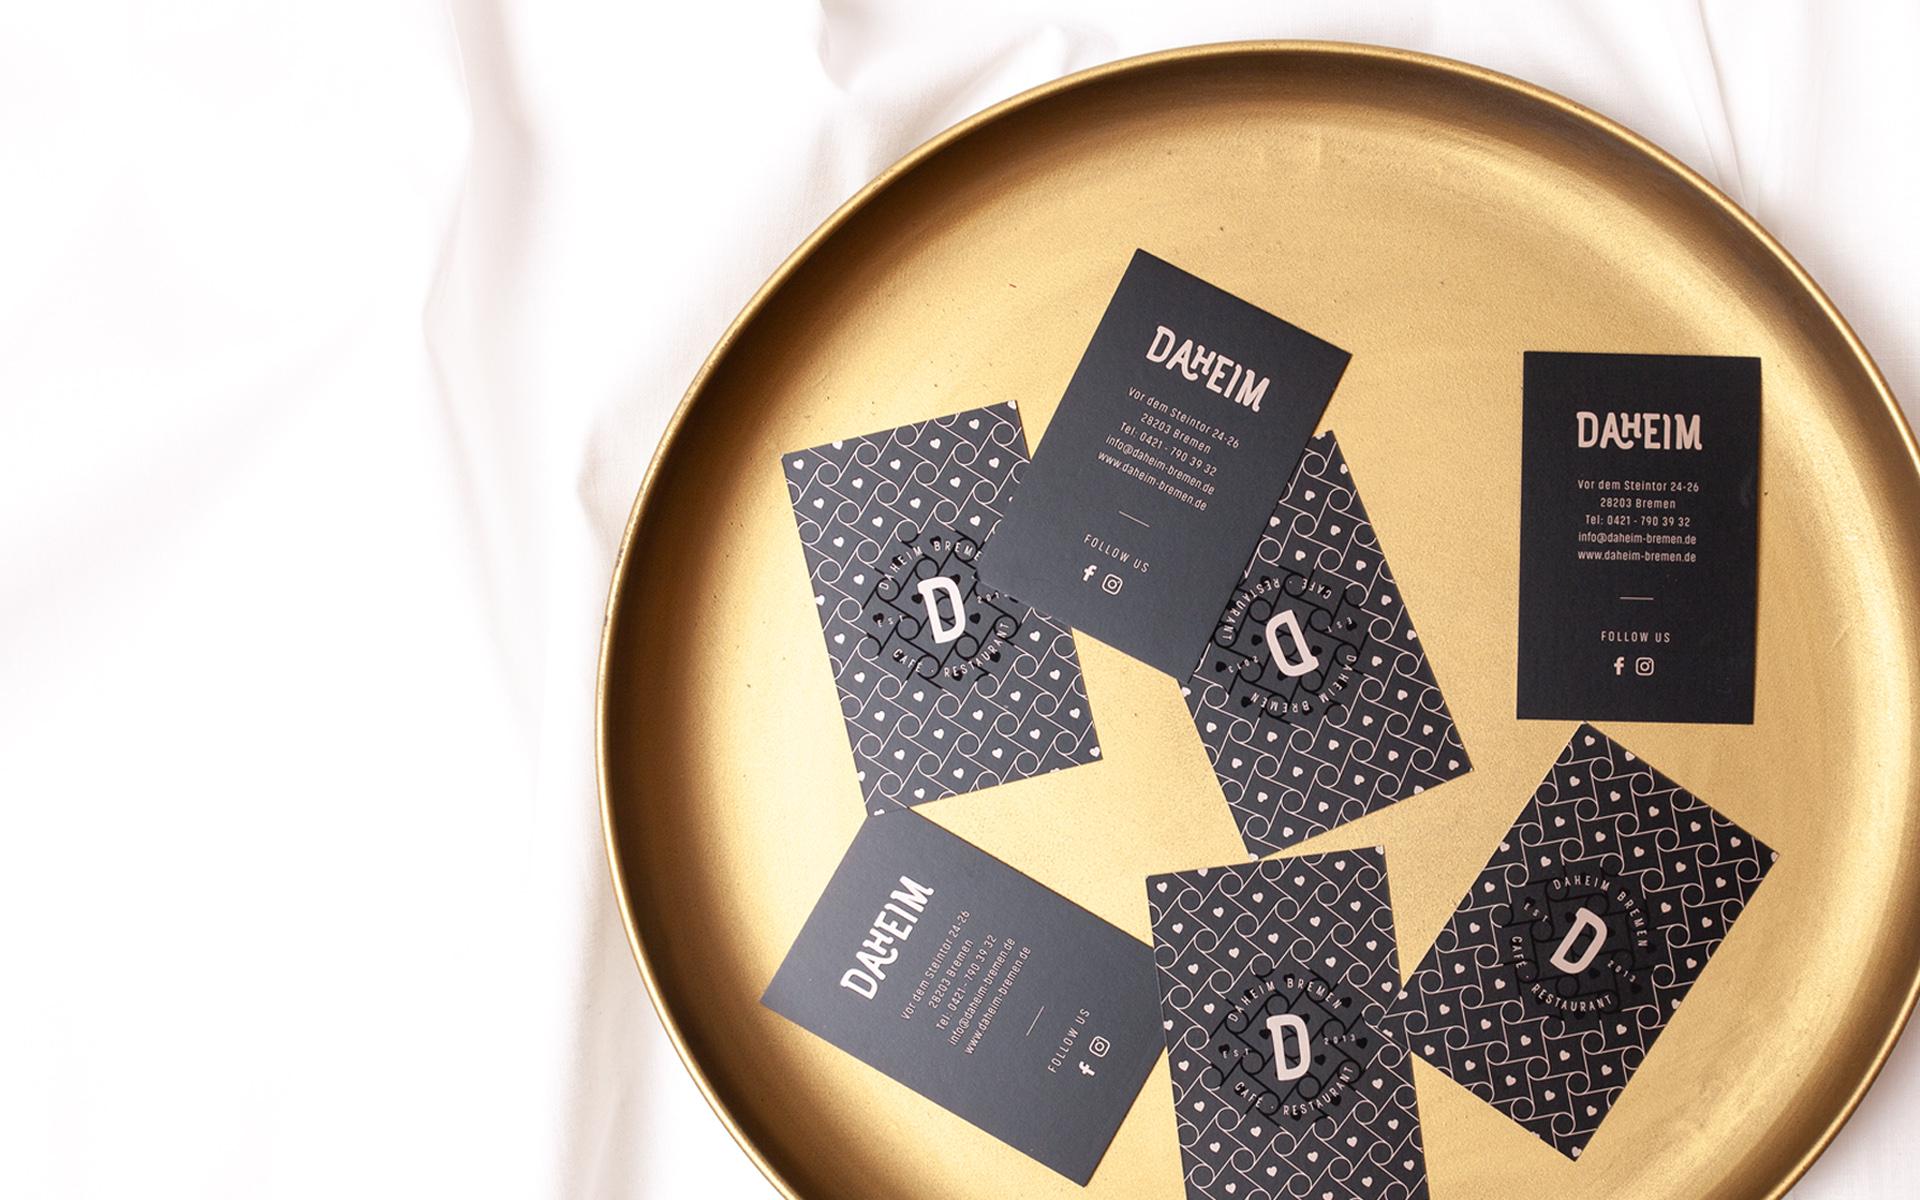 Daheim Restaurantbranding Grafikdesign Bremen Designed